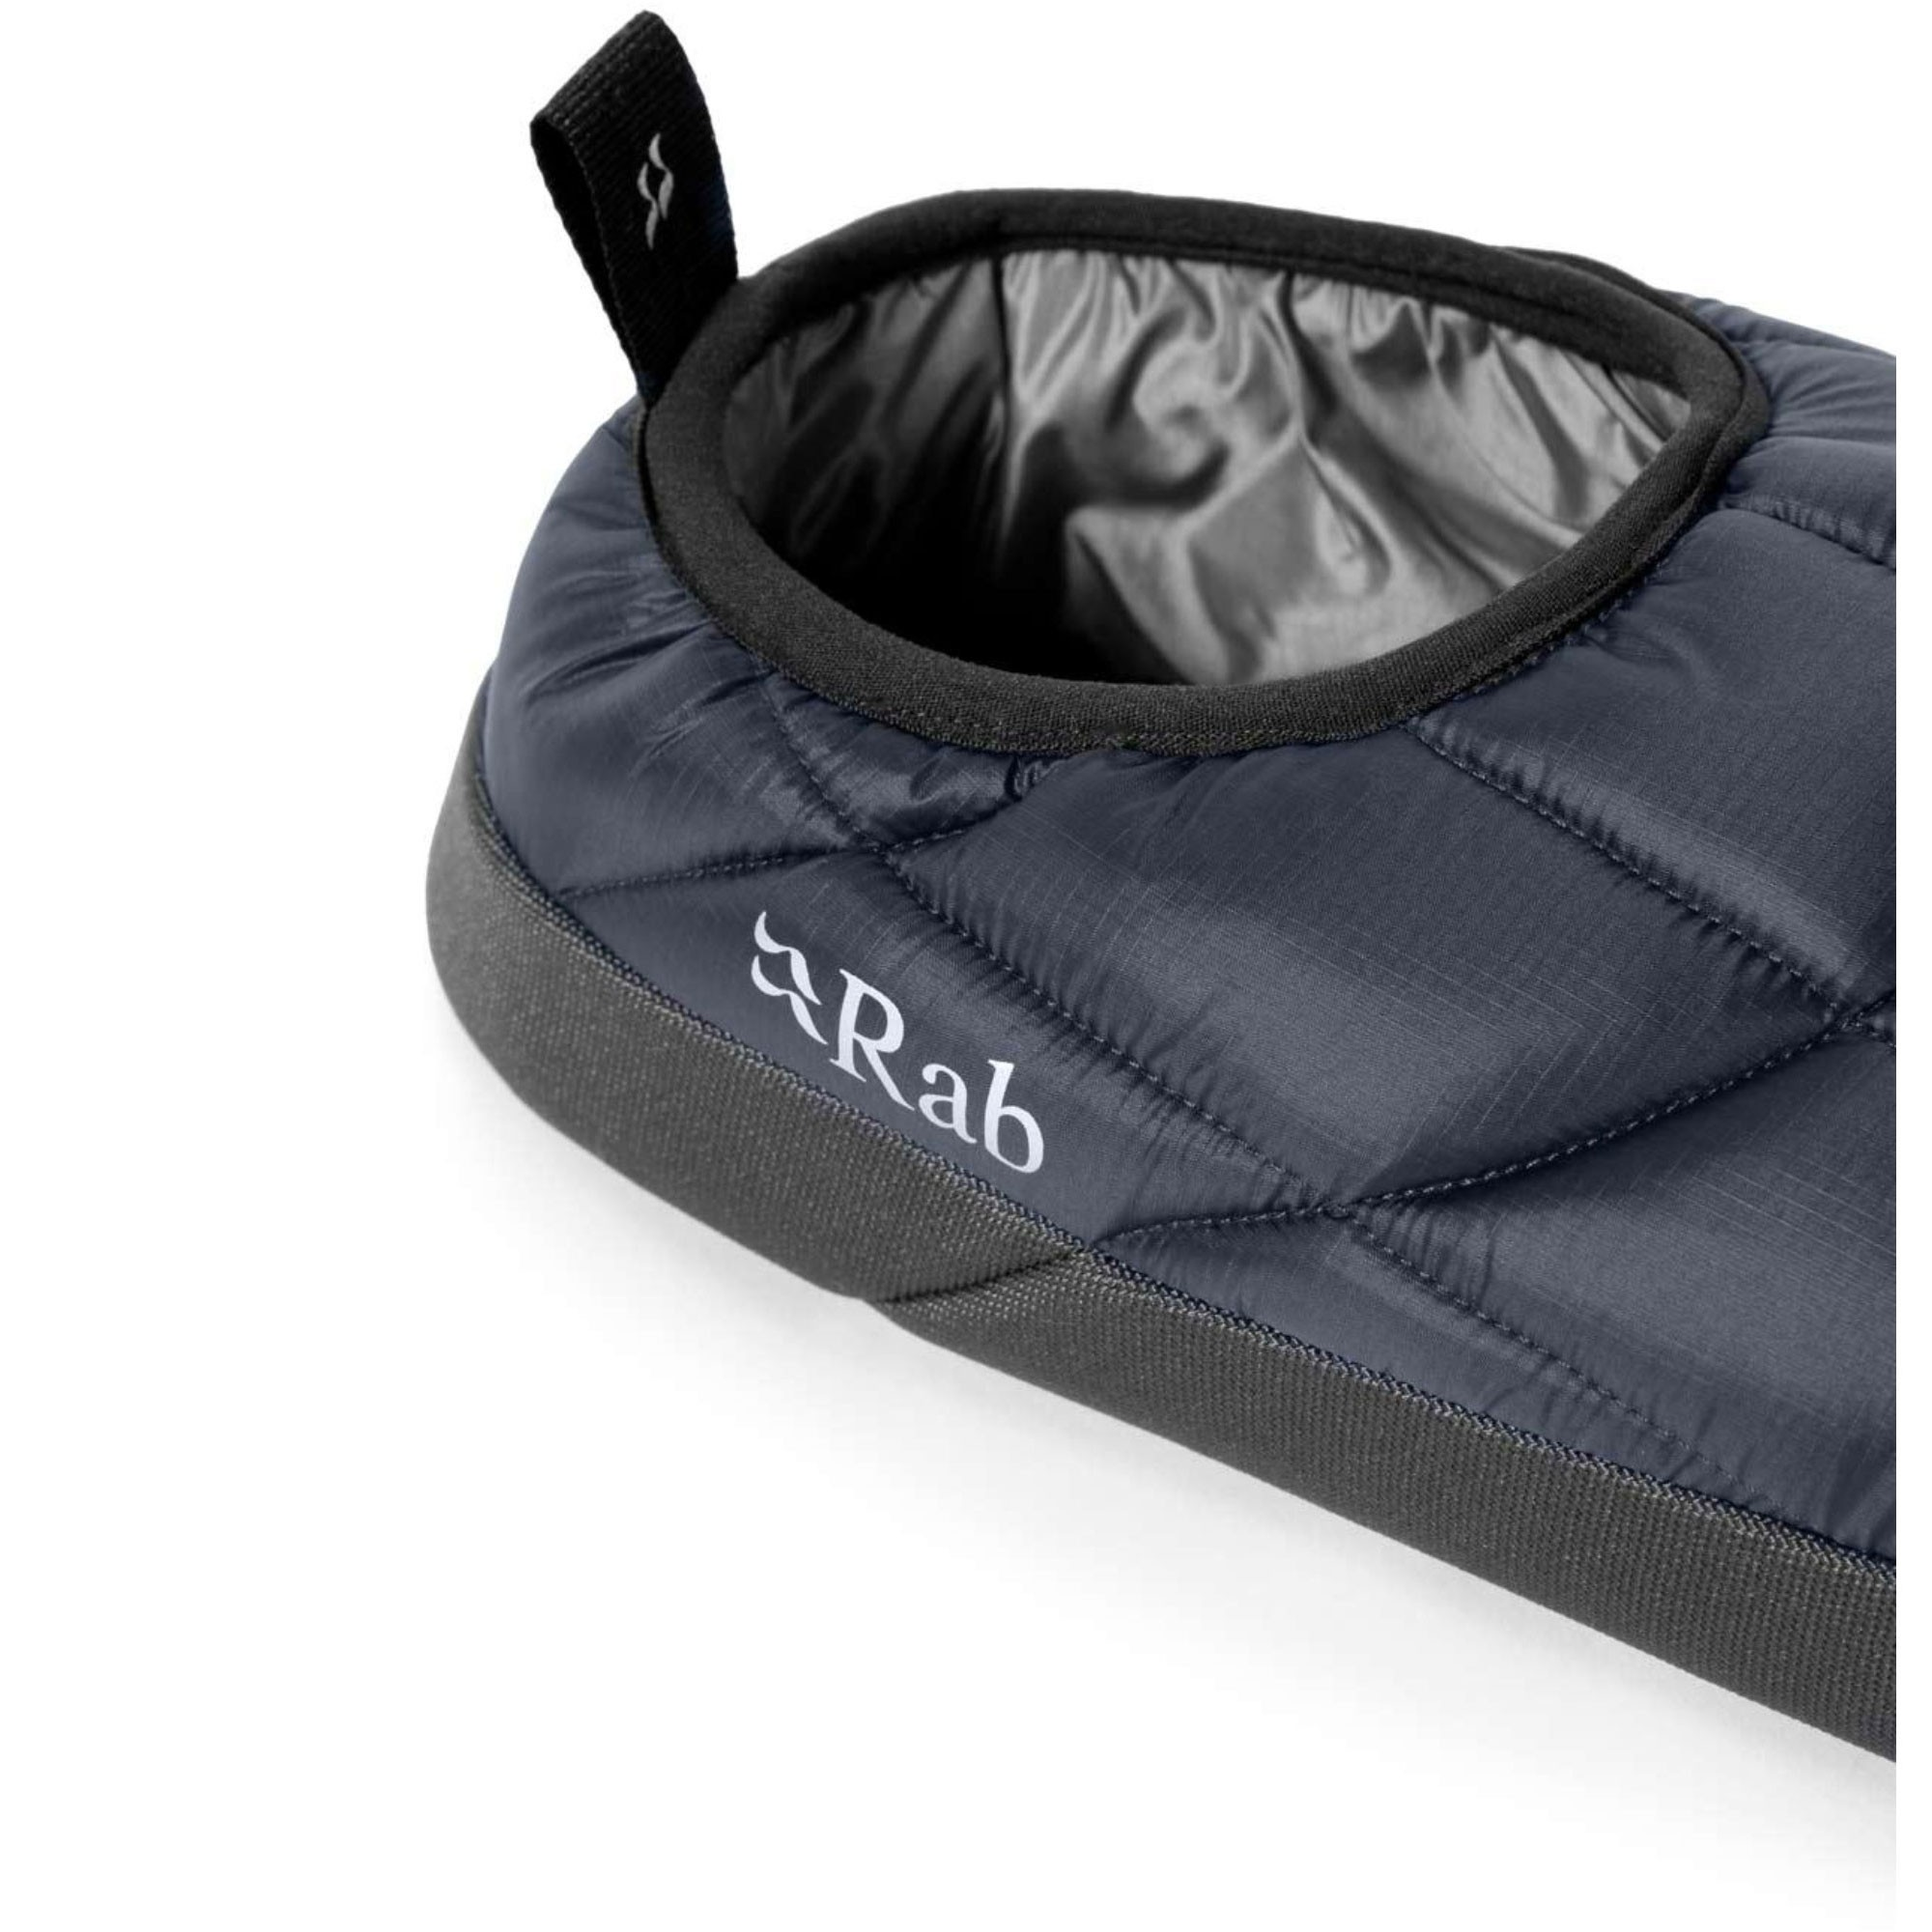 Rab Hut Slippers - Beluga